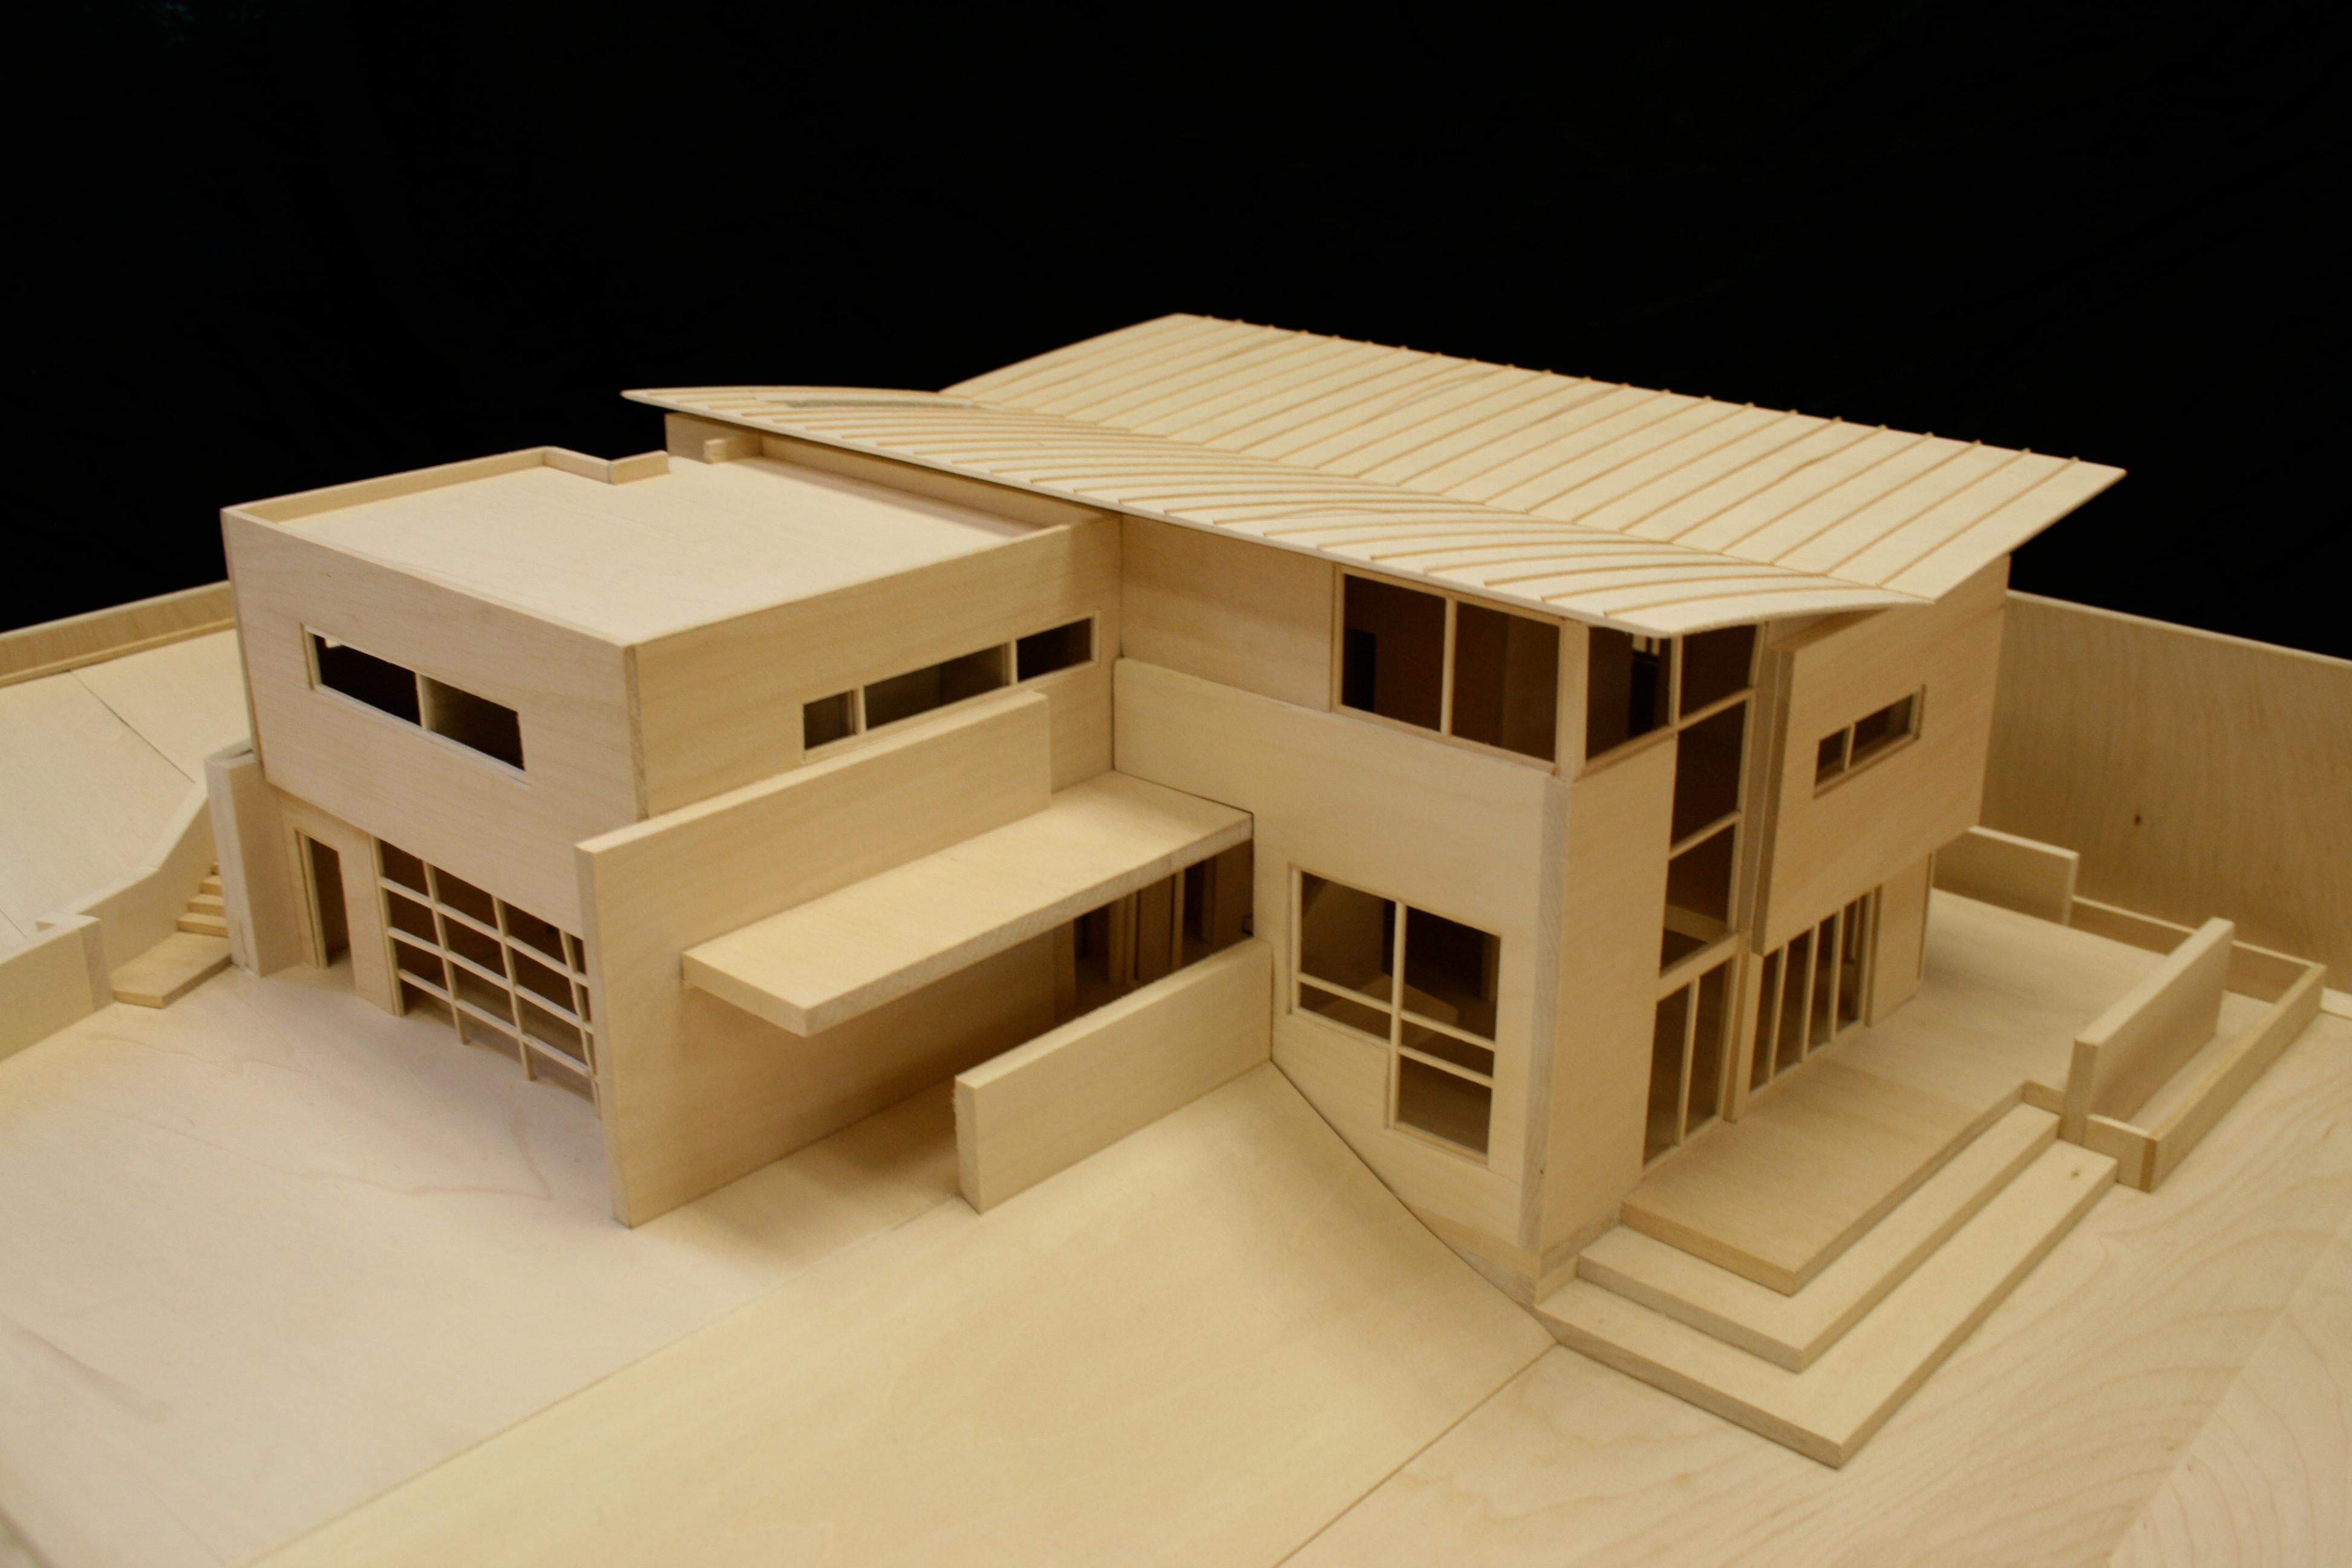 architectural models architecture residence pdf 3d digital computer hand portfolio modern designs salary ambler built designblendz reply